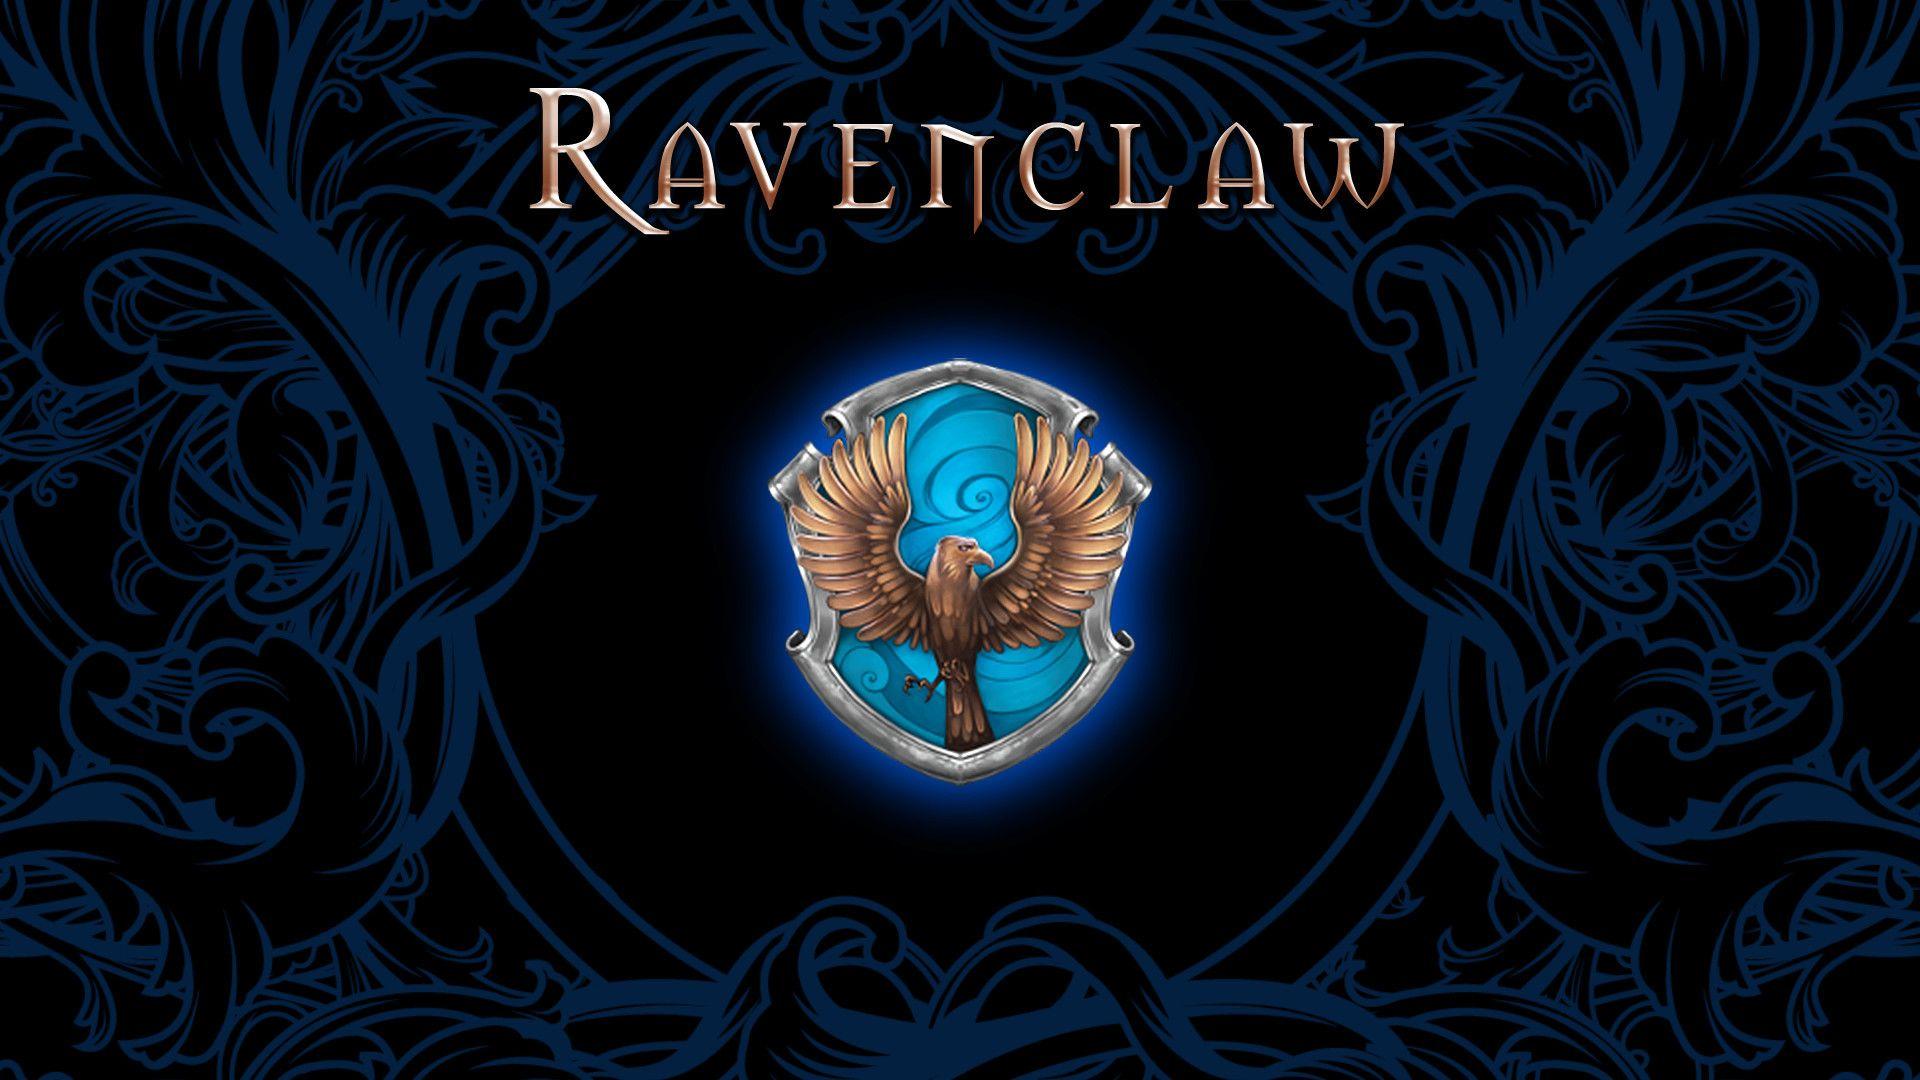 Ravenclaw Wallpaper Harry Potter Wallpaper Ravenclaw Slytherin Wallpaper